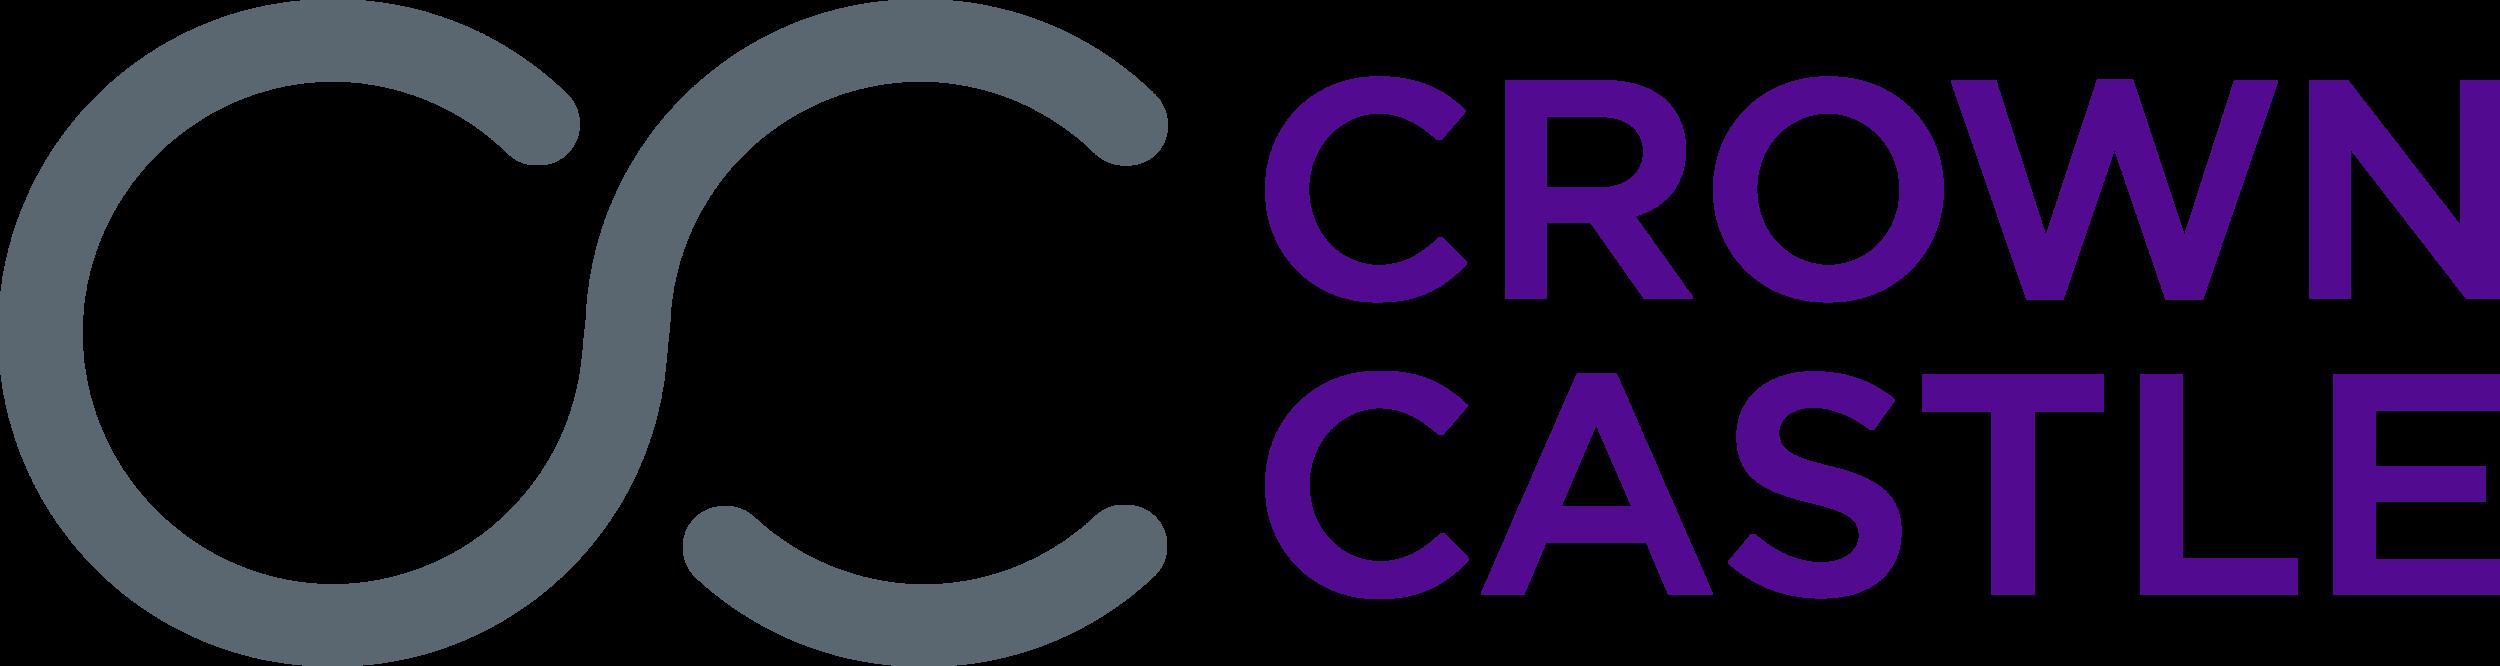 CCMasterbrand_Logo_RGB (002).png